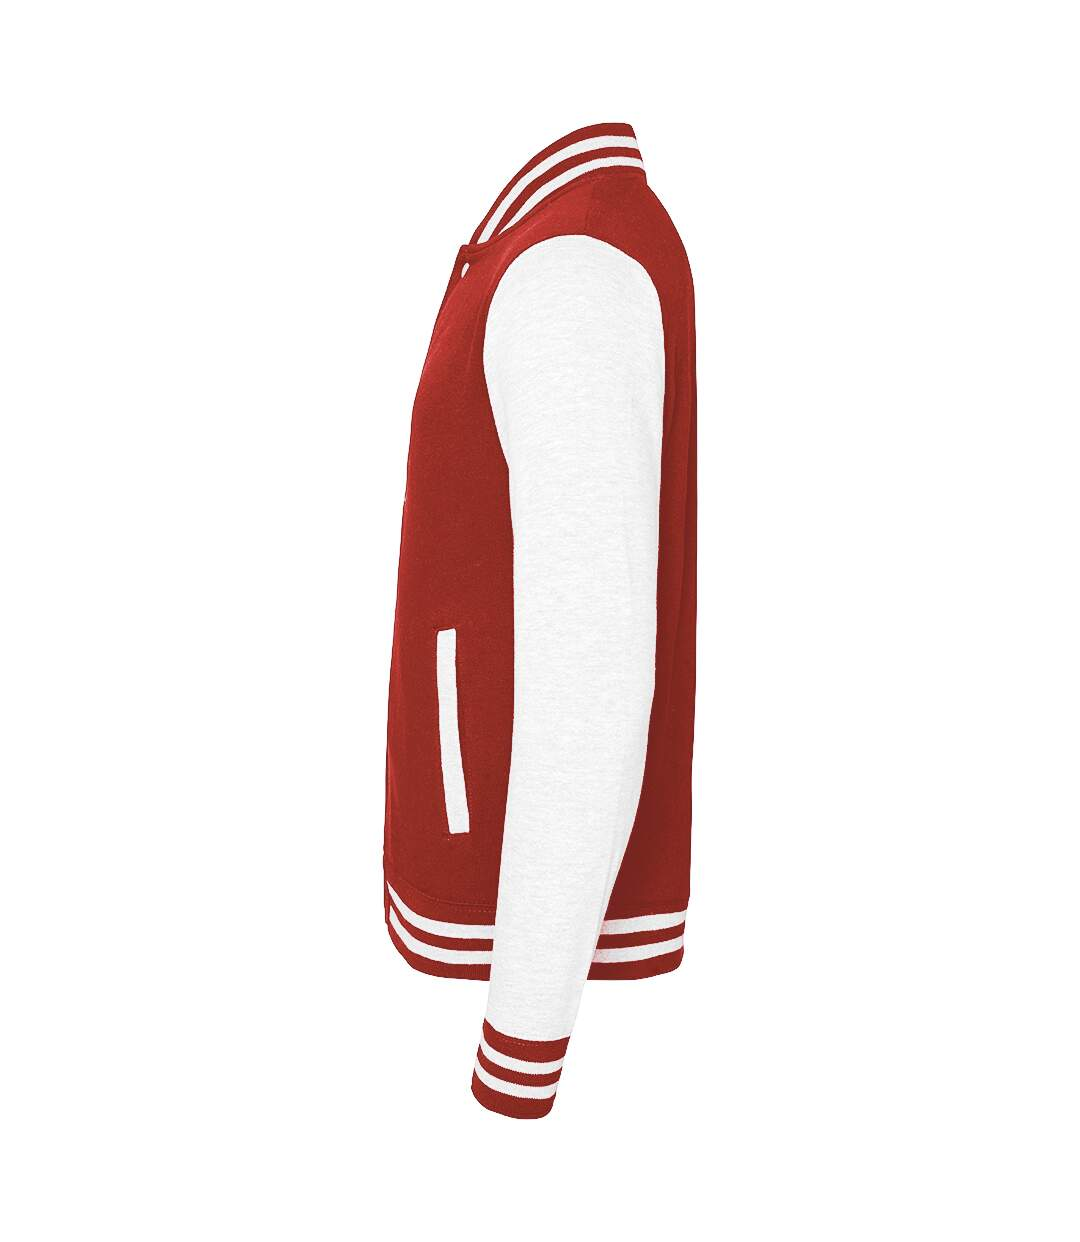 Awdis - Veste - Hommes (Rouge /Blanc) - UTRW175